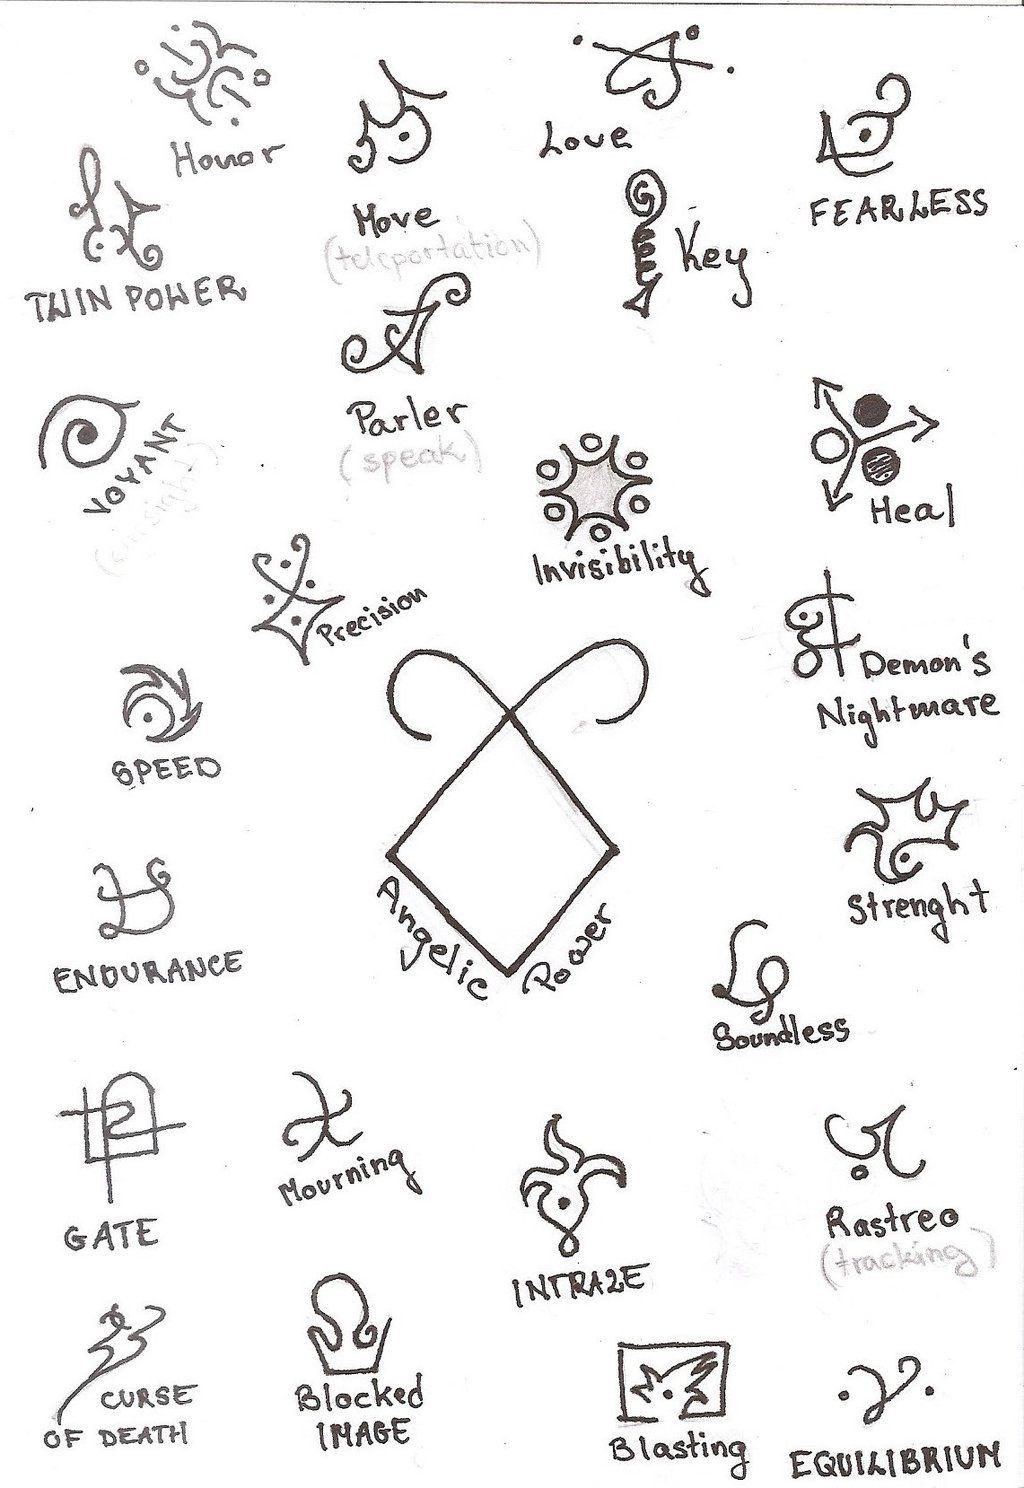 a7745a88b0e86 Mortal+Instruments+Runes   Runes - Mortal Instruments by ~arter123 on  deviantART